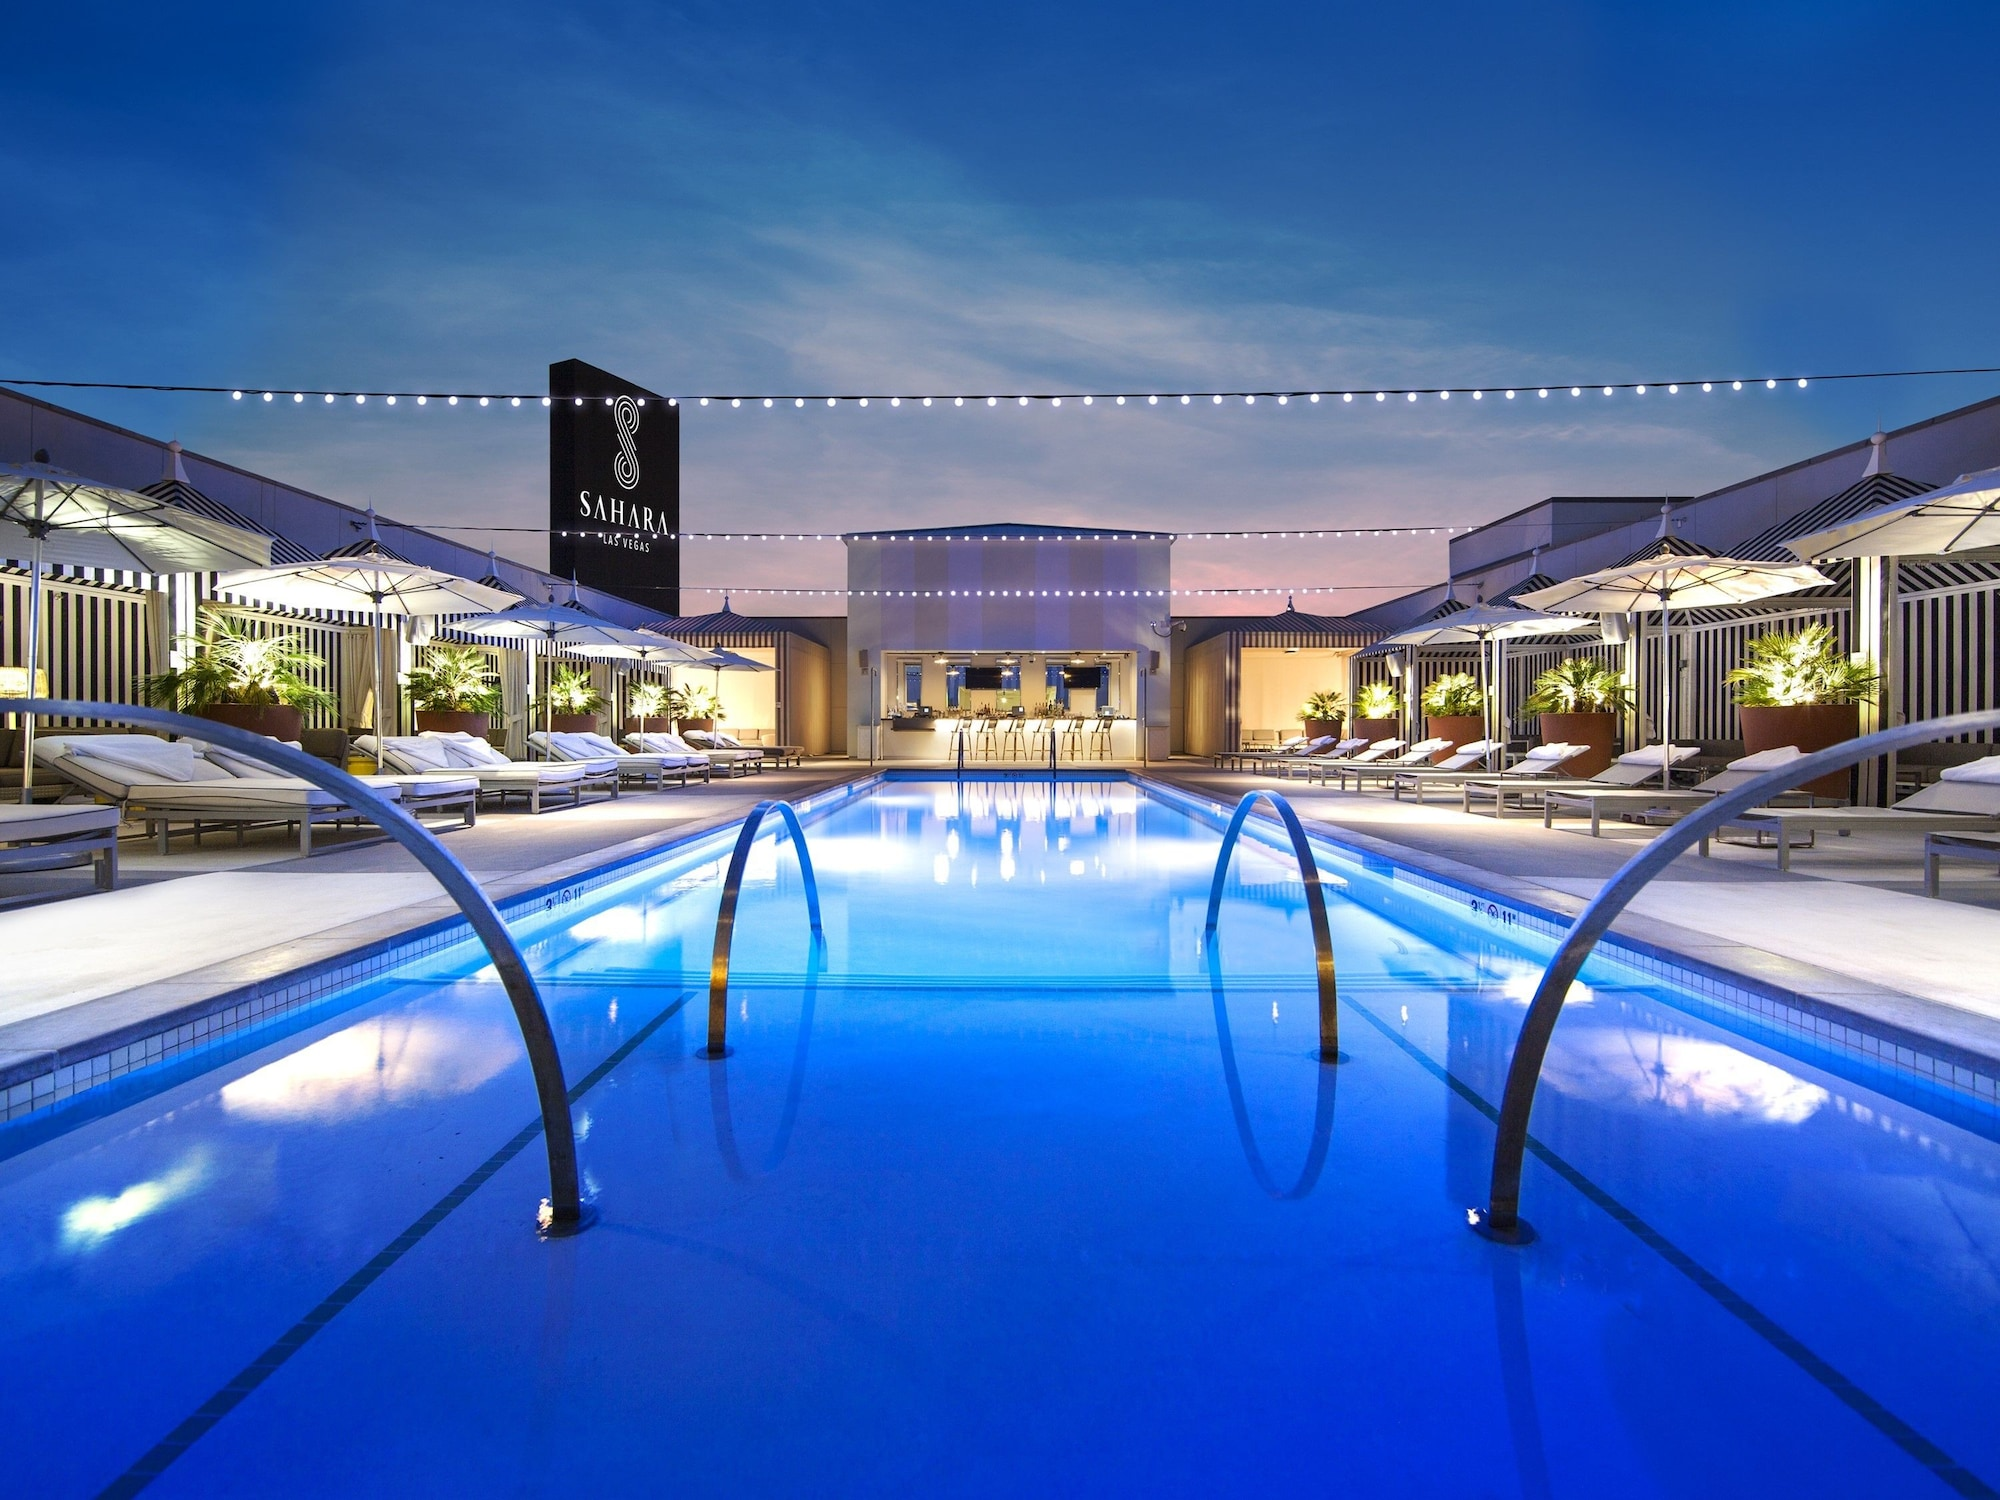 SAHARA Las Vegas, Clark